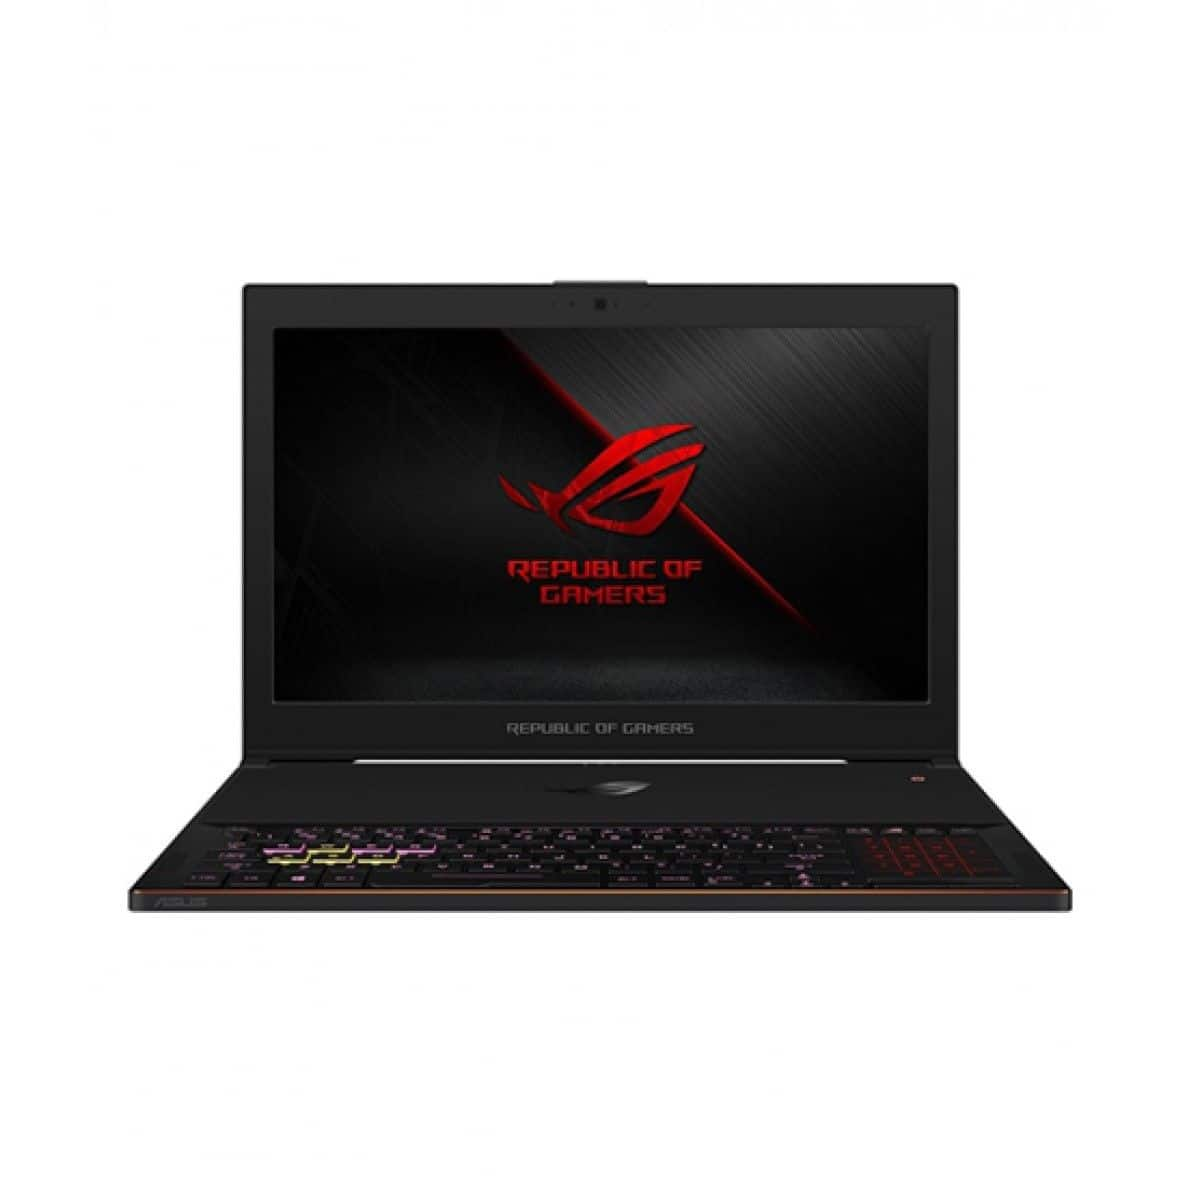 "Asus GX501GI-XS74 15.6"" Laptop Intel i7-8750H up to 4.10 GHz 16GB 512GB NVMe $1949.99 + Free Shipping"